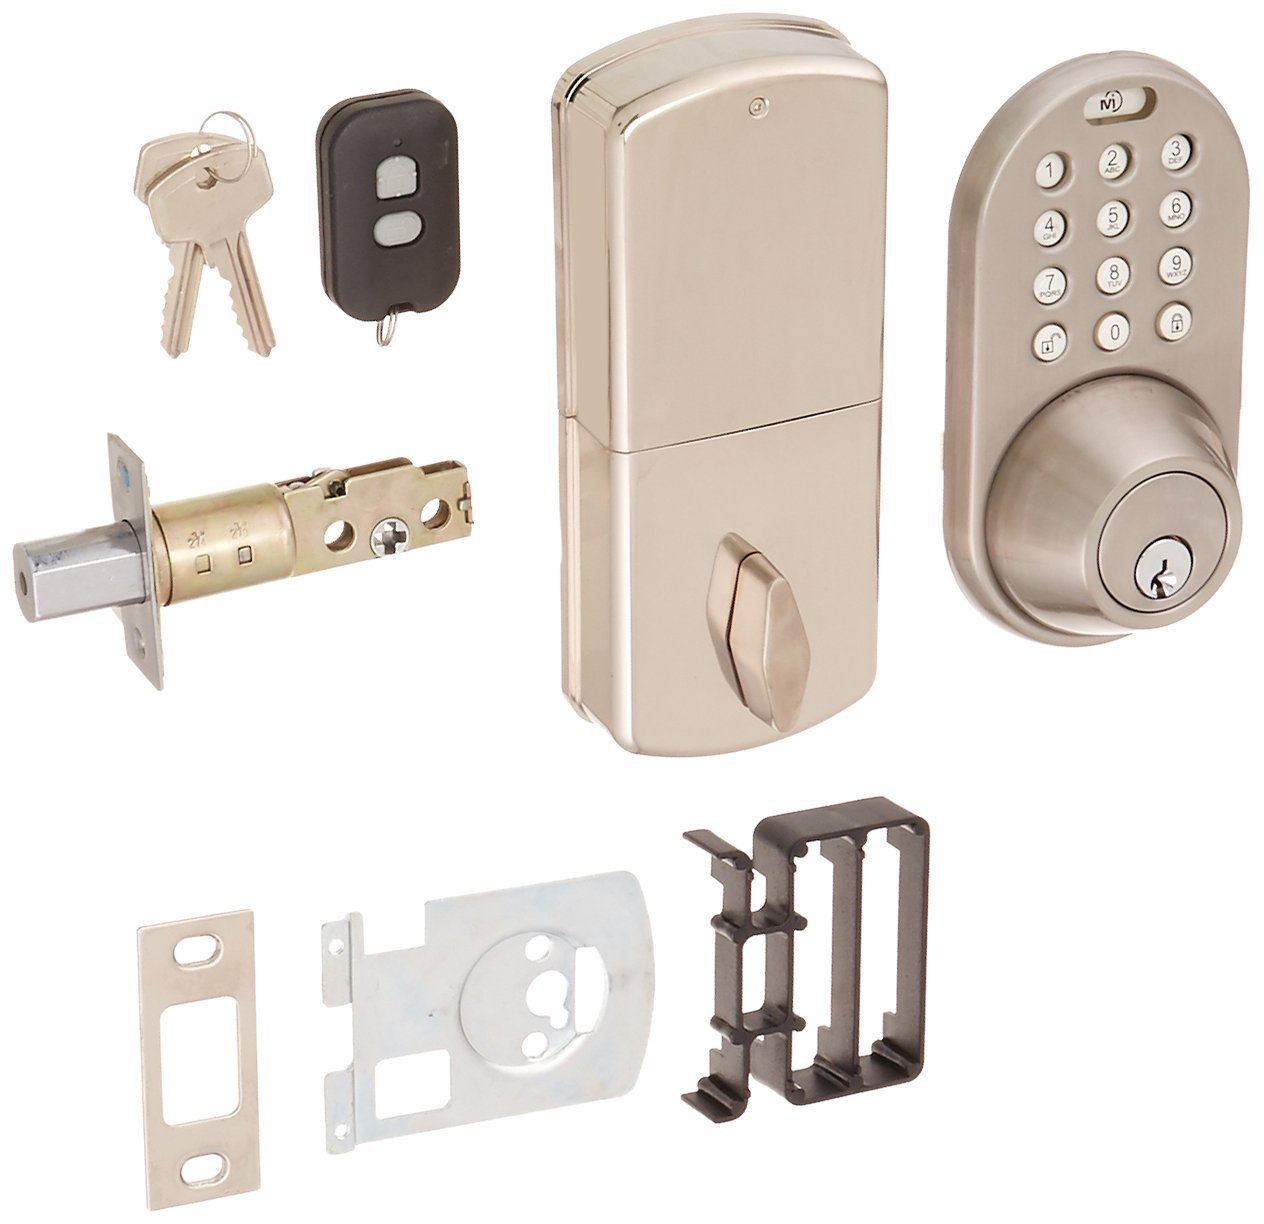 Cheap Keyless Door Entry Find Keyless Door Entry Deals On Line At